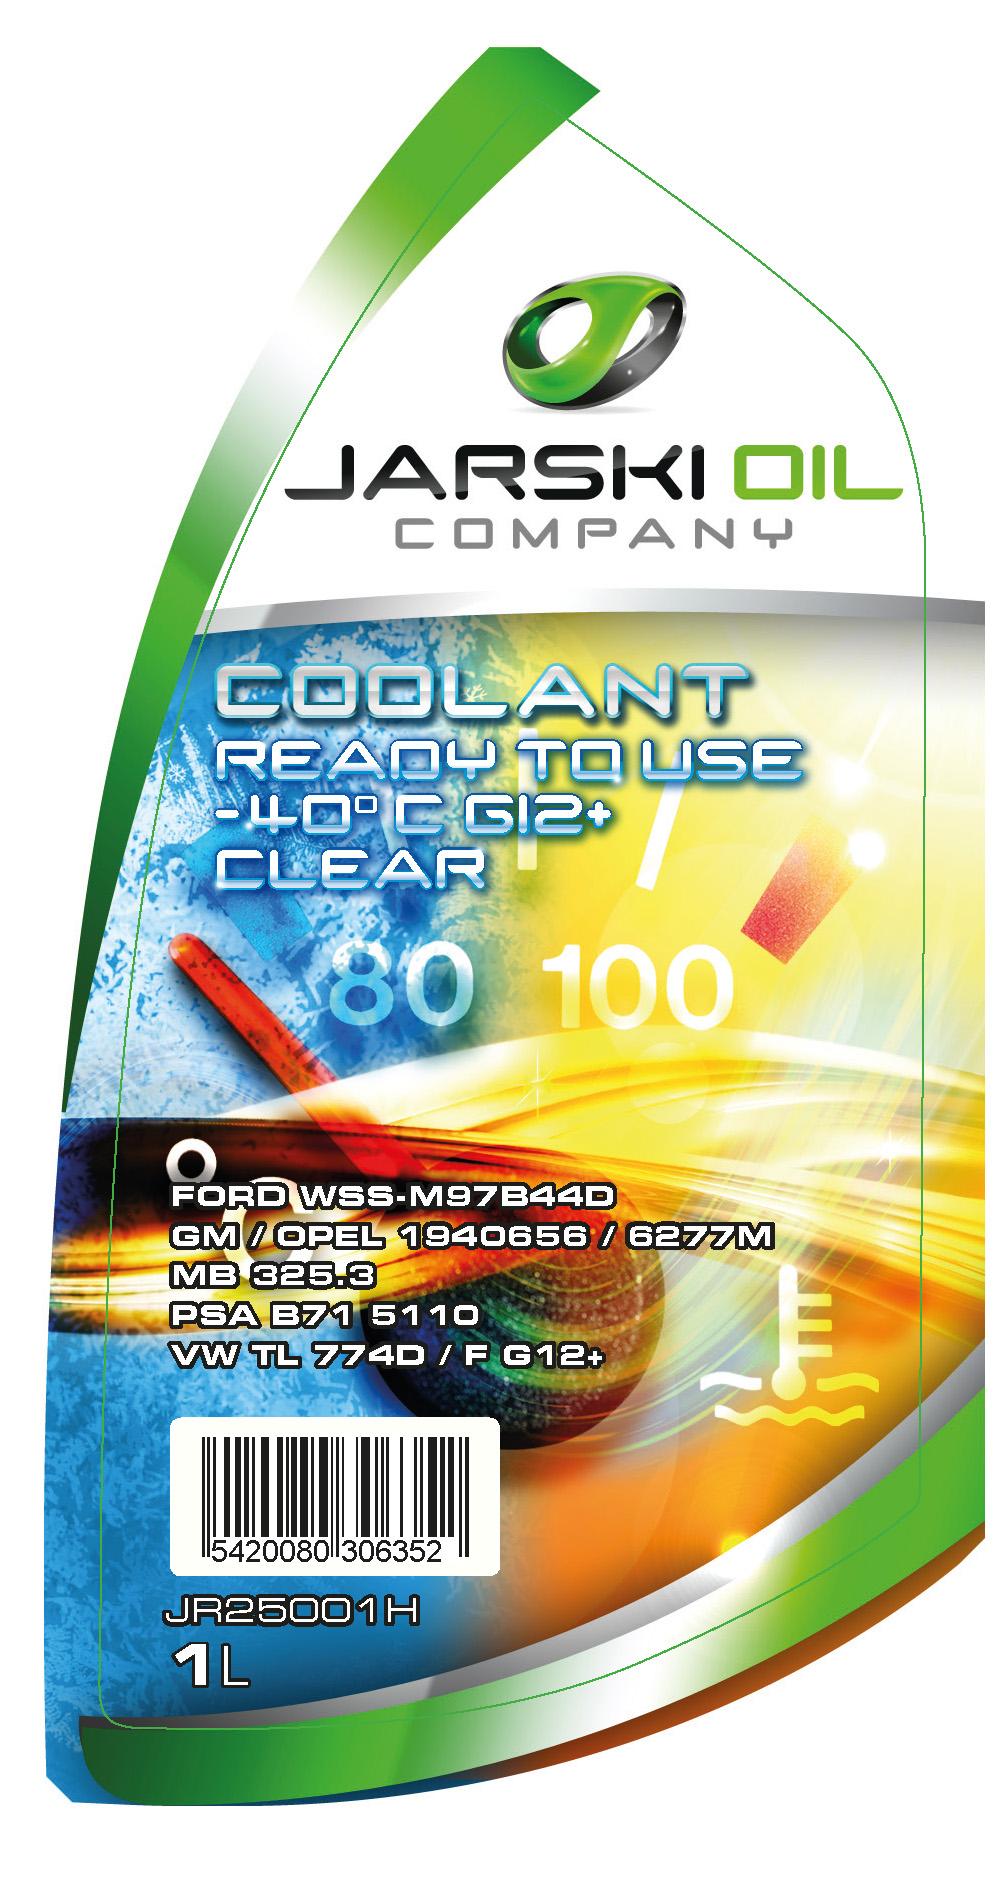 Liquides refroidissement JARSKIOIL JR25001H d'origine